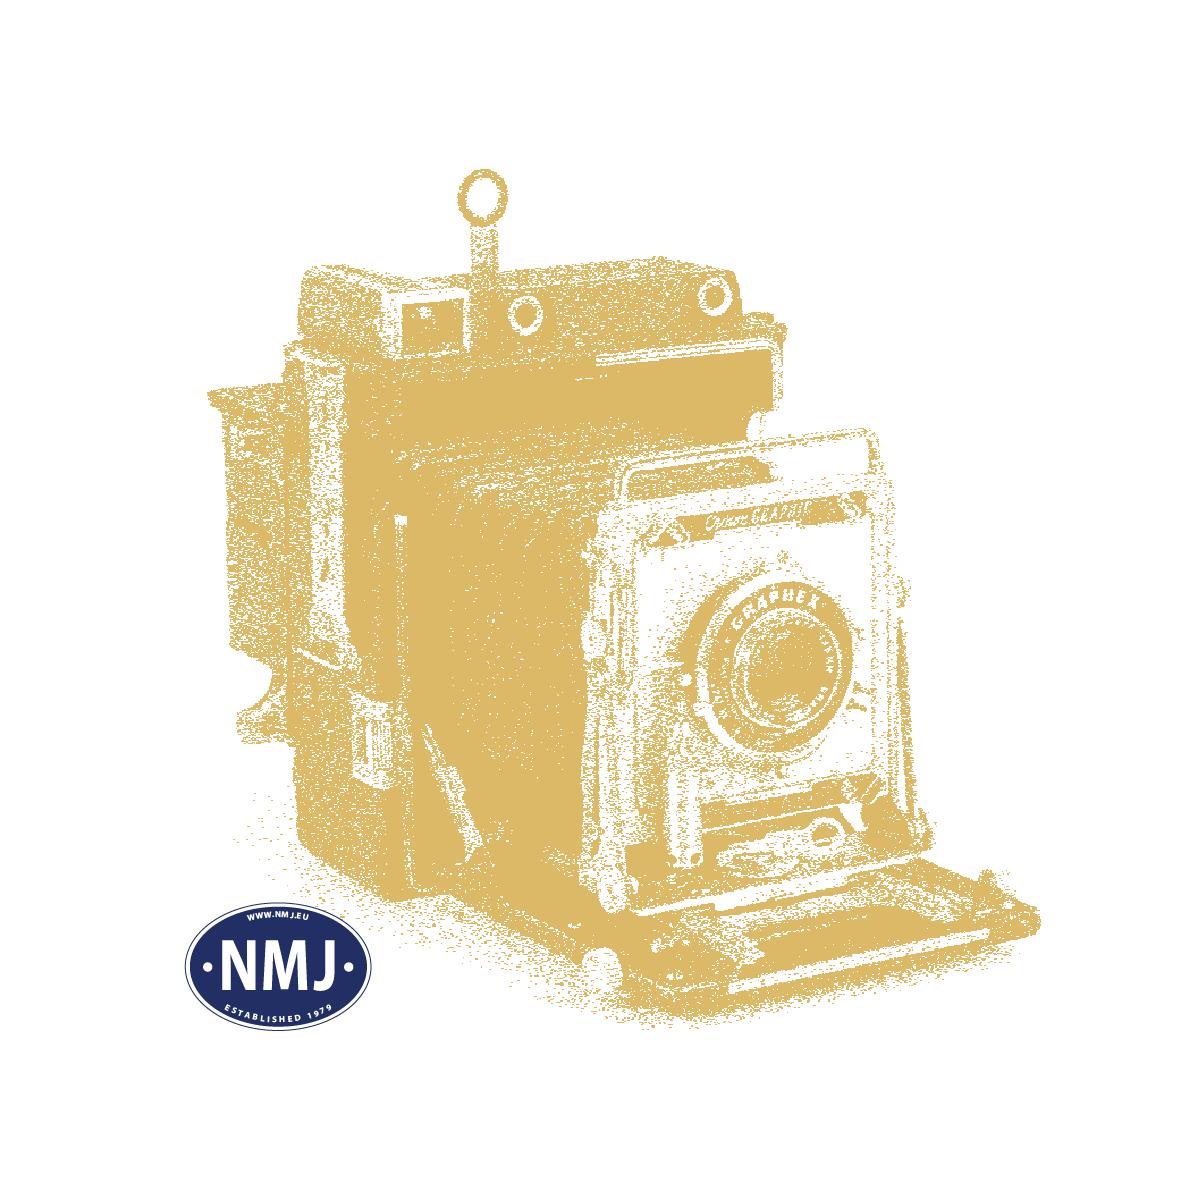 NMJT503.106 - NMJ Topline NSB Gbkls 158 5446-1